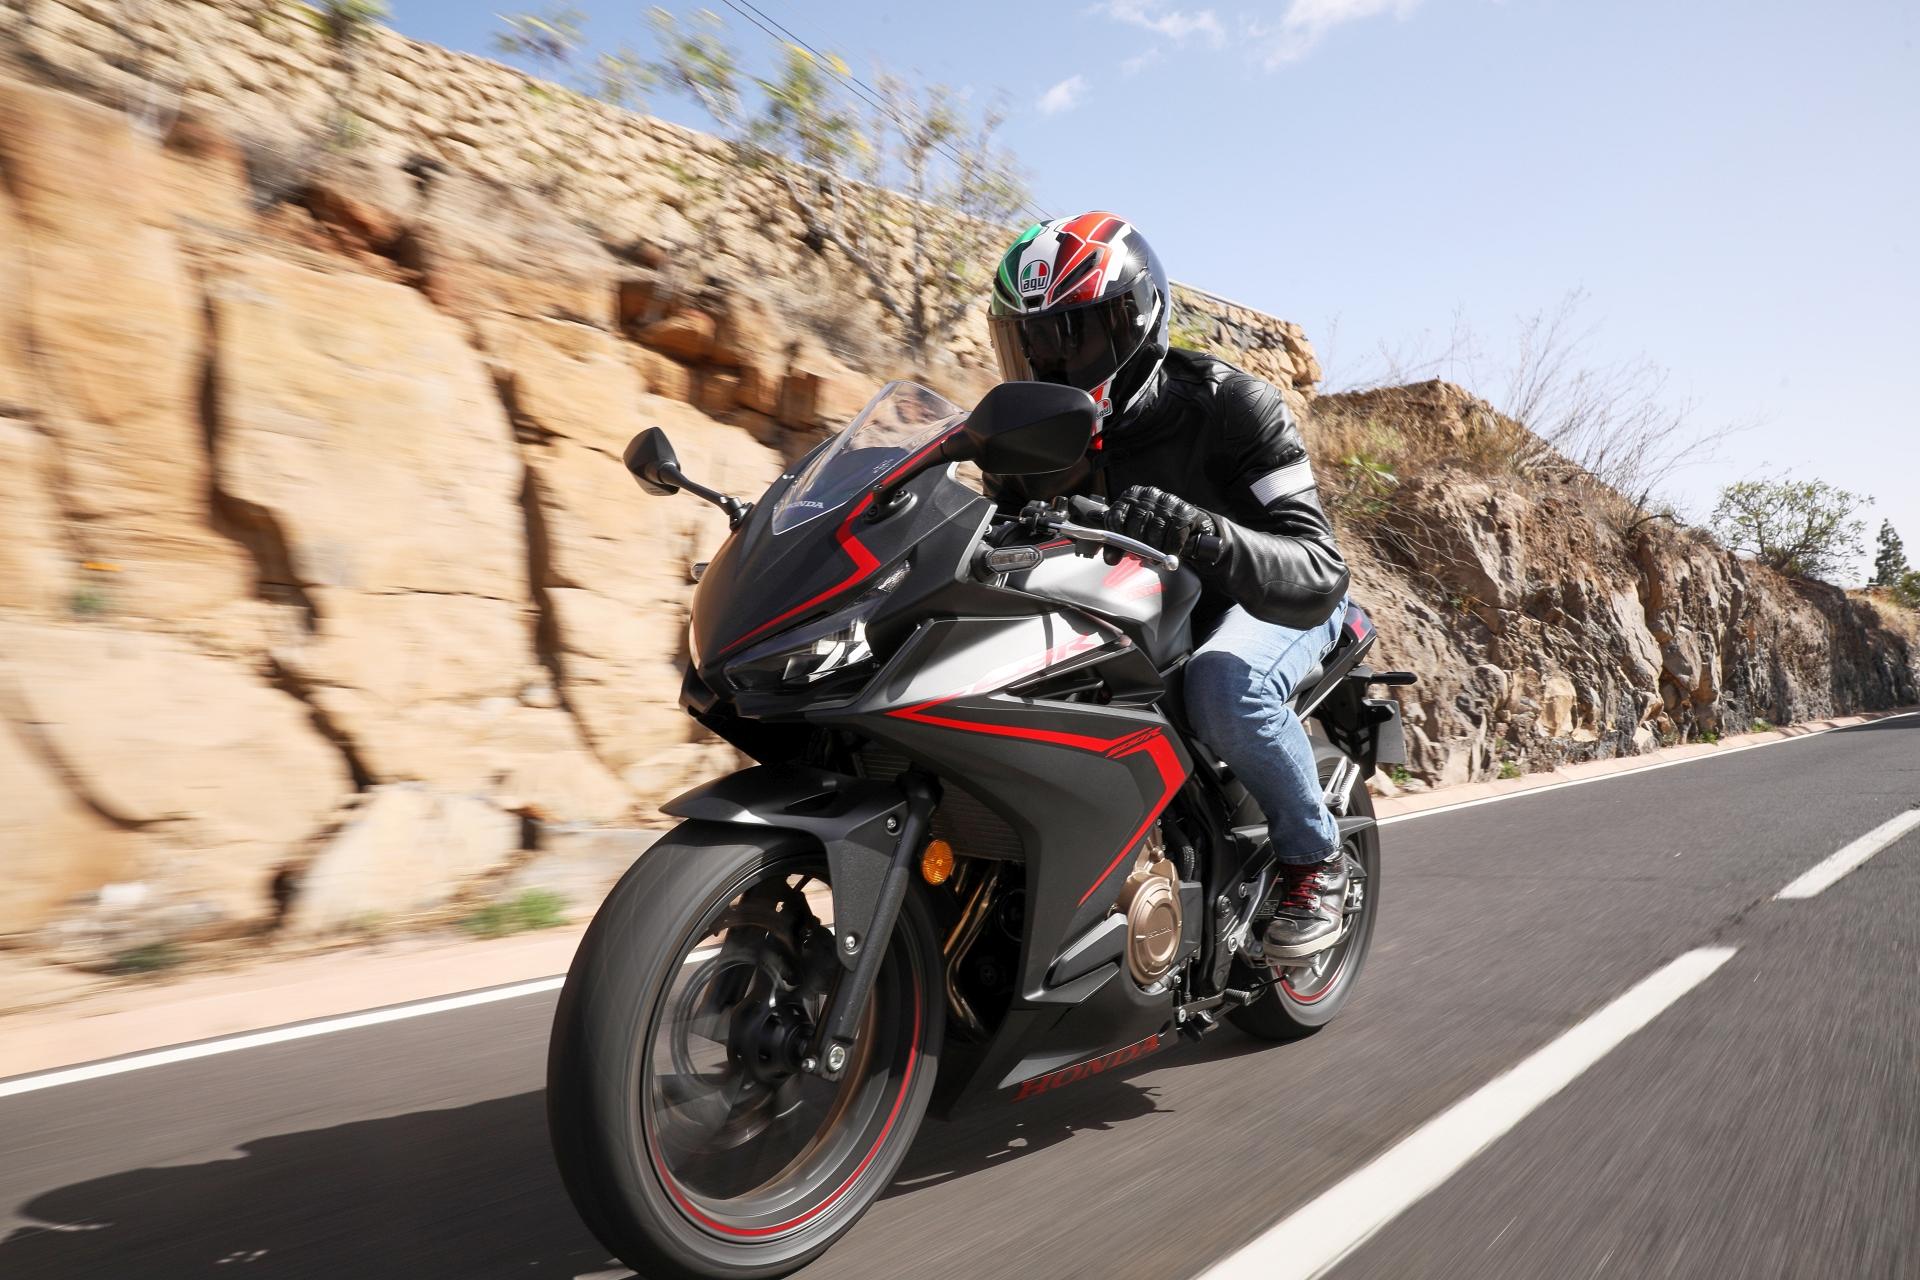 Honda CBR500R Motocykl dla niskich osób